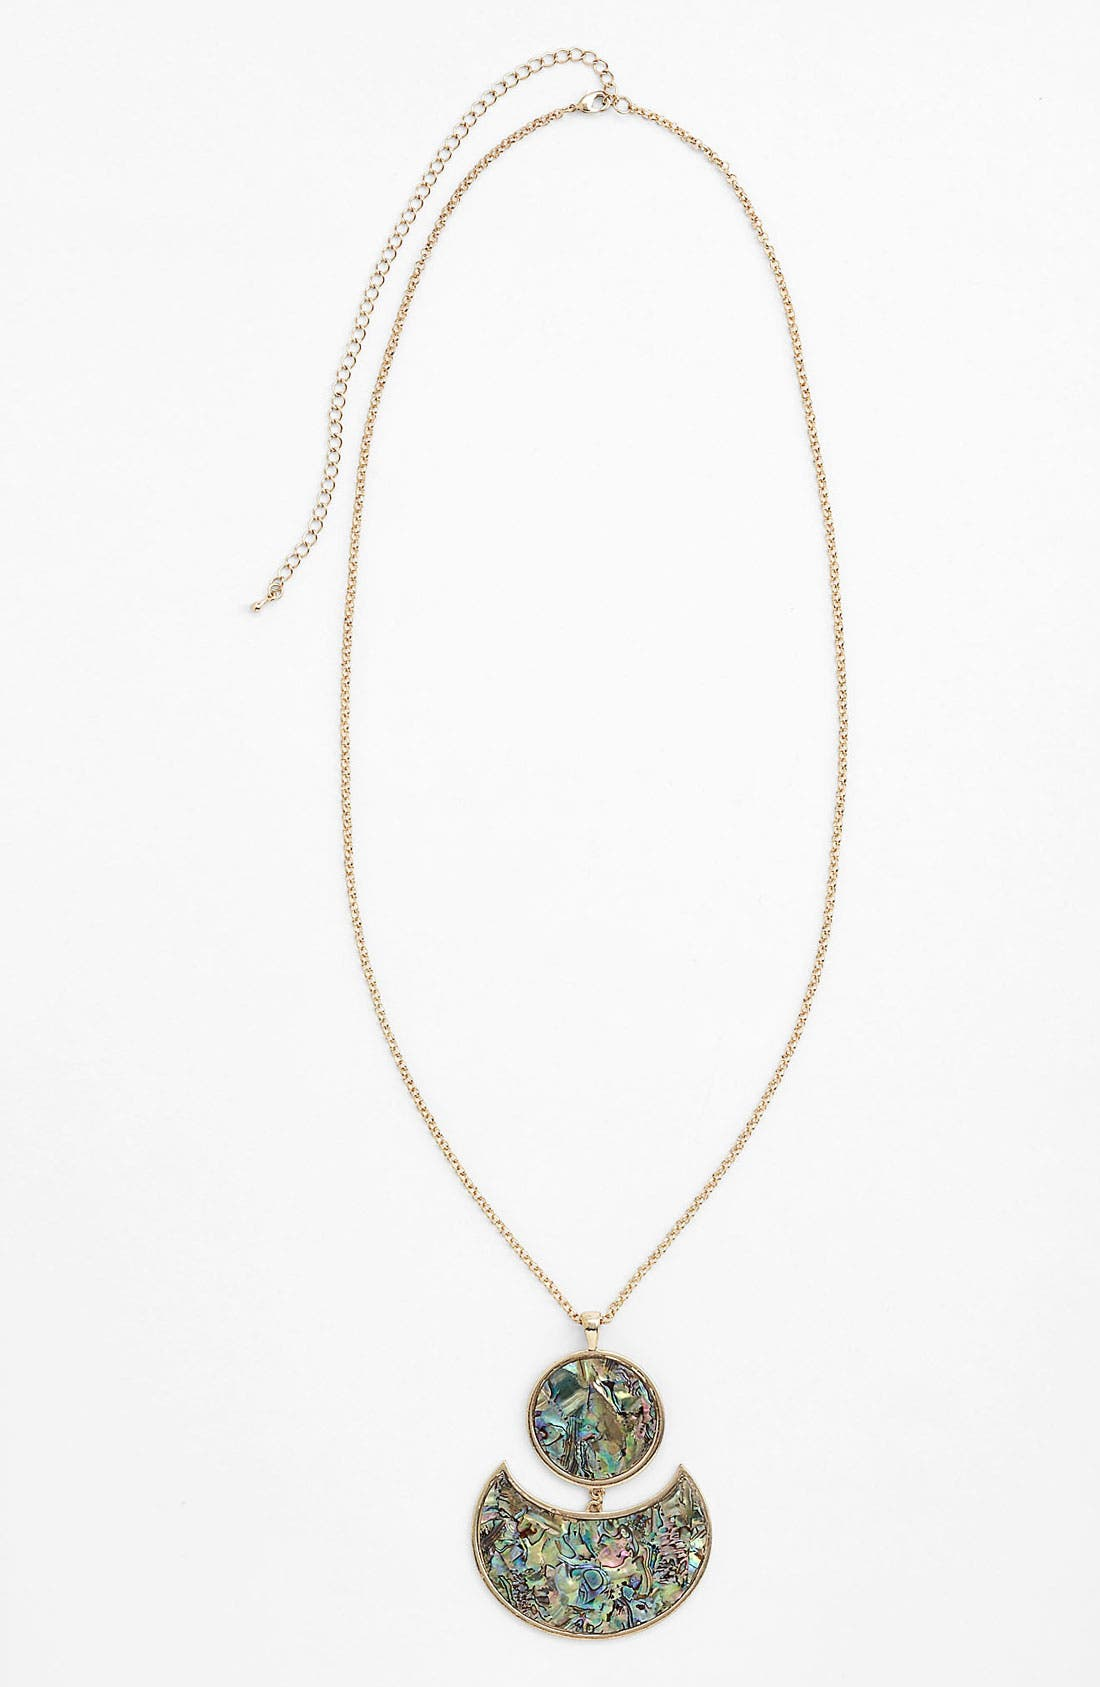 Alternate Image 1 Selected - Panacea 'Abalone Circle Crescent' Pendant Necklace